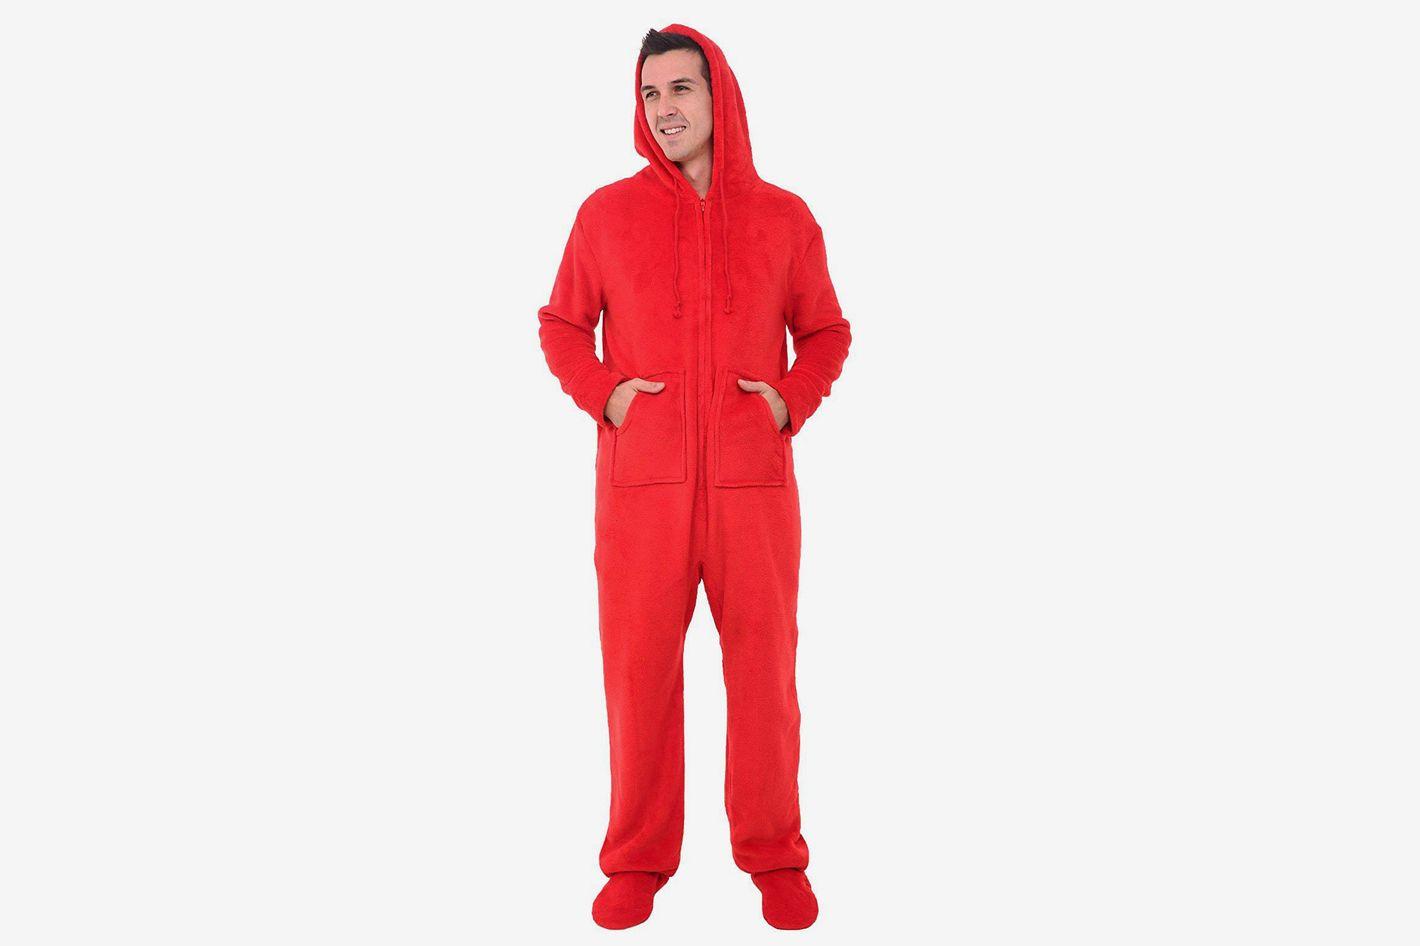 Christmas Pajamas Onesie.16 Best Christmas Onesies 2018 The Strategist New York